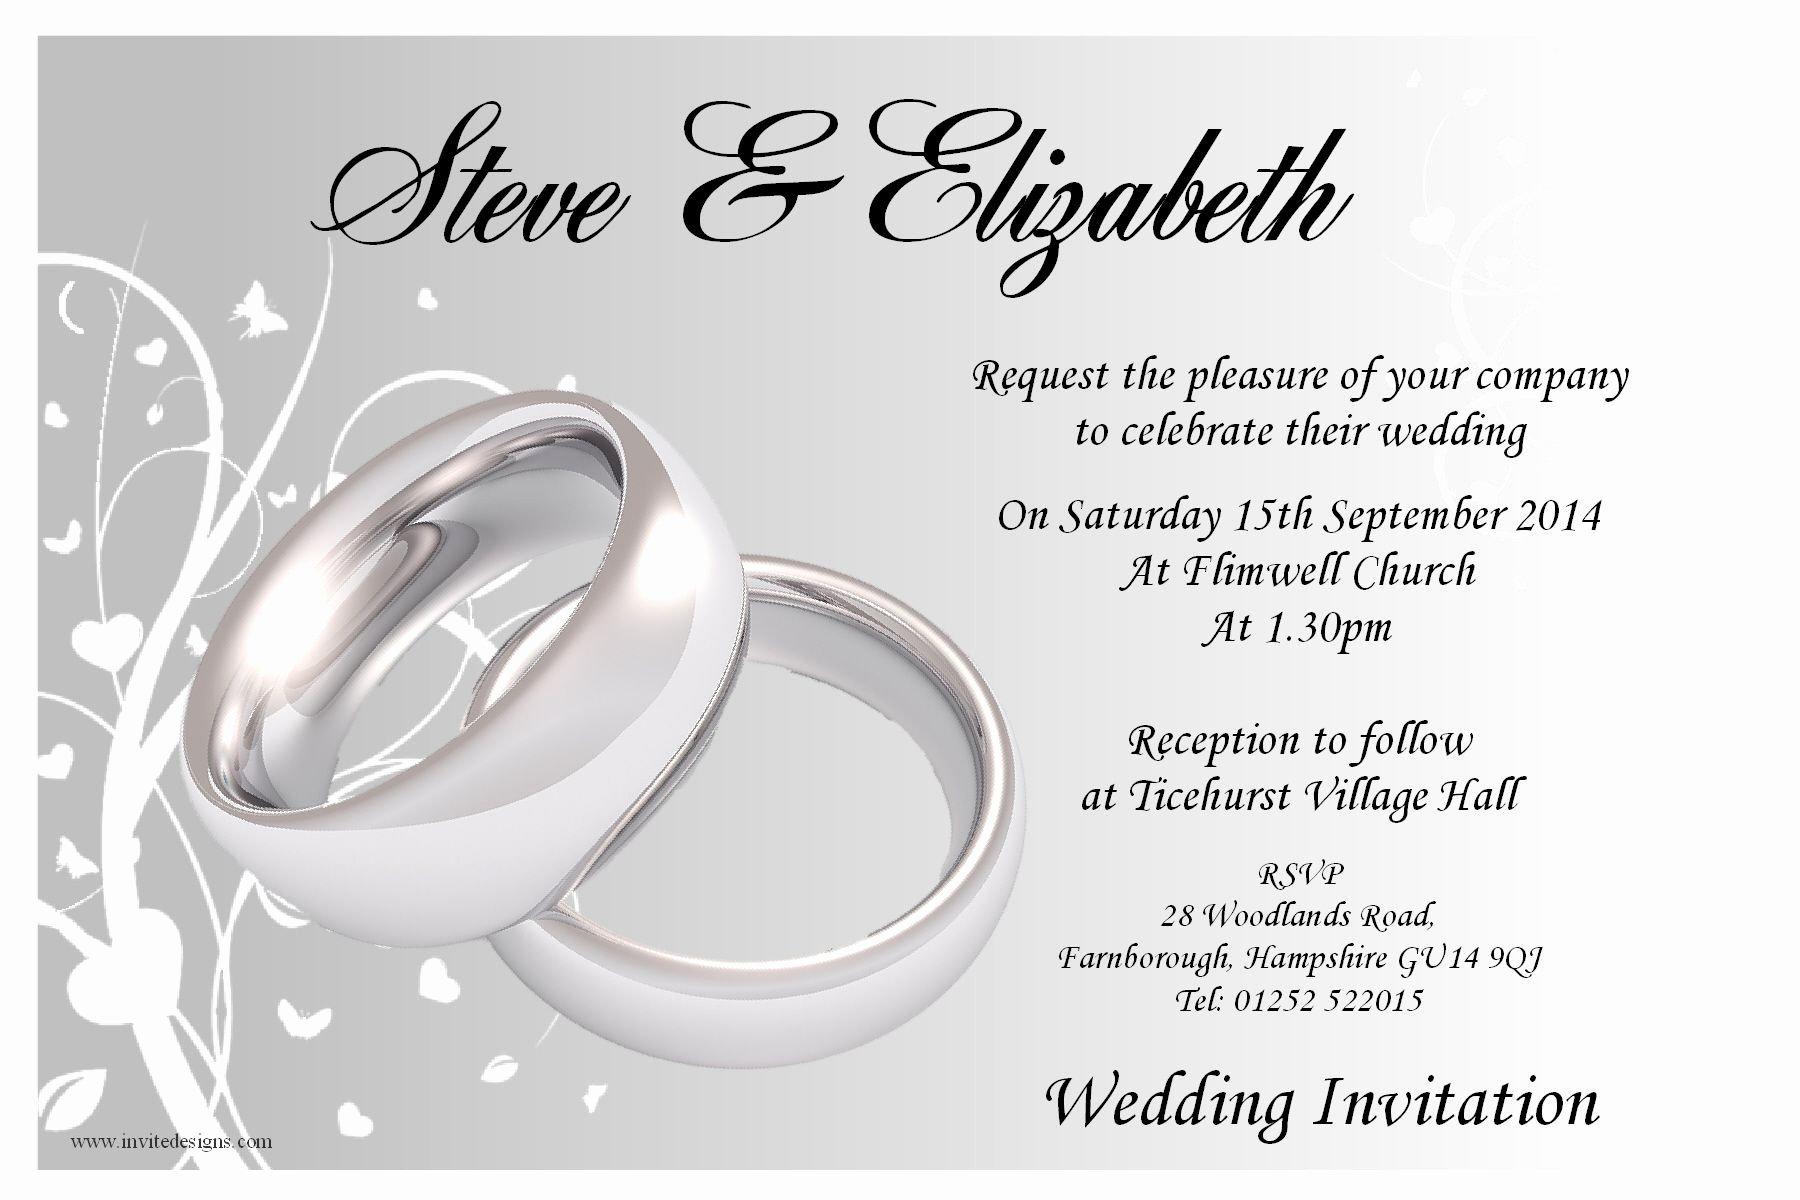 Wedding Invitations Templates for Wedding Invitations